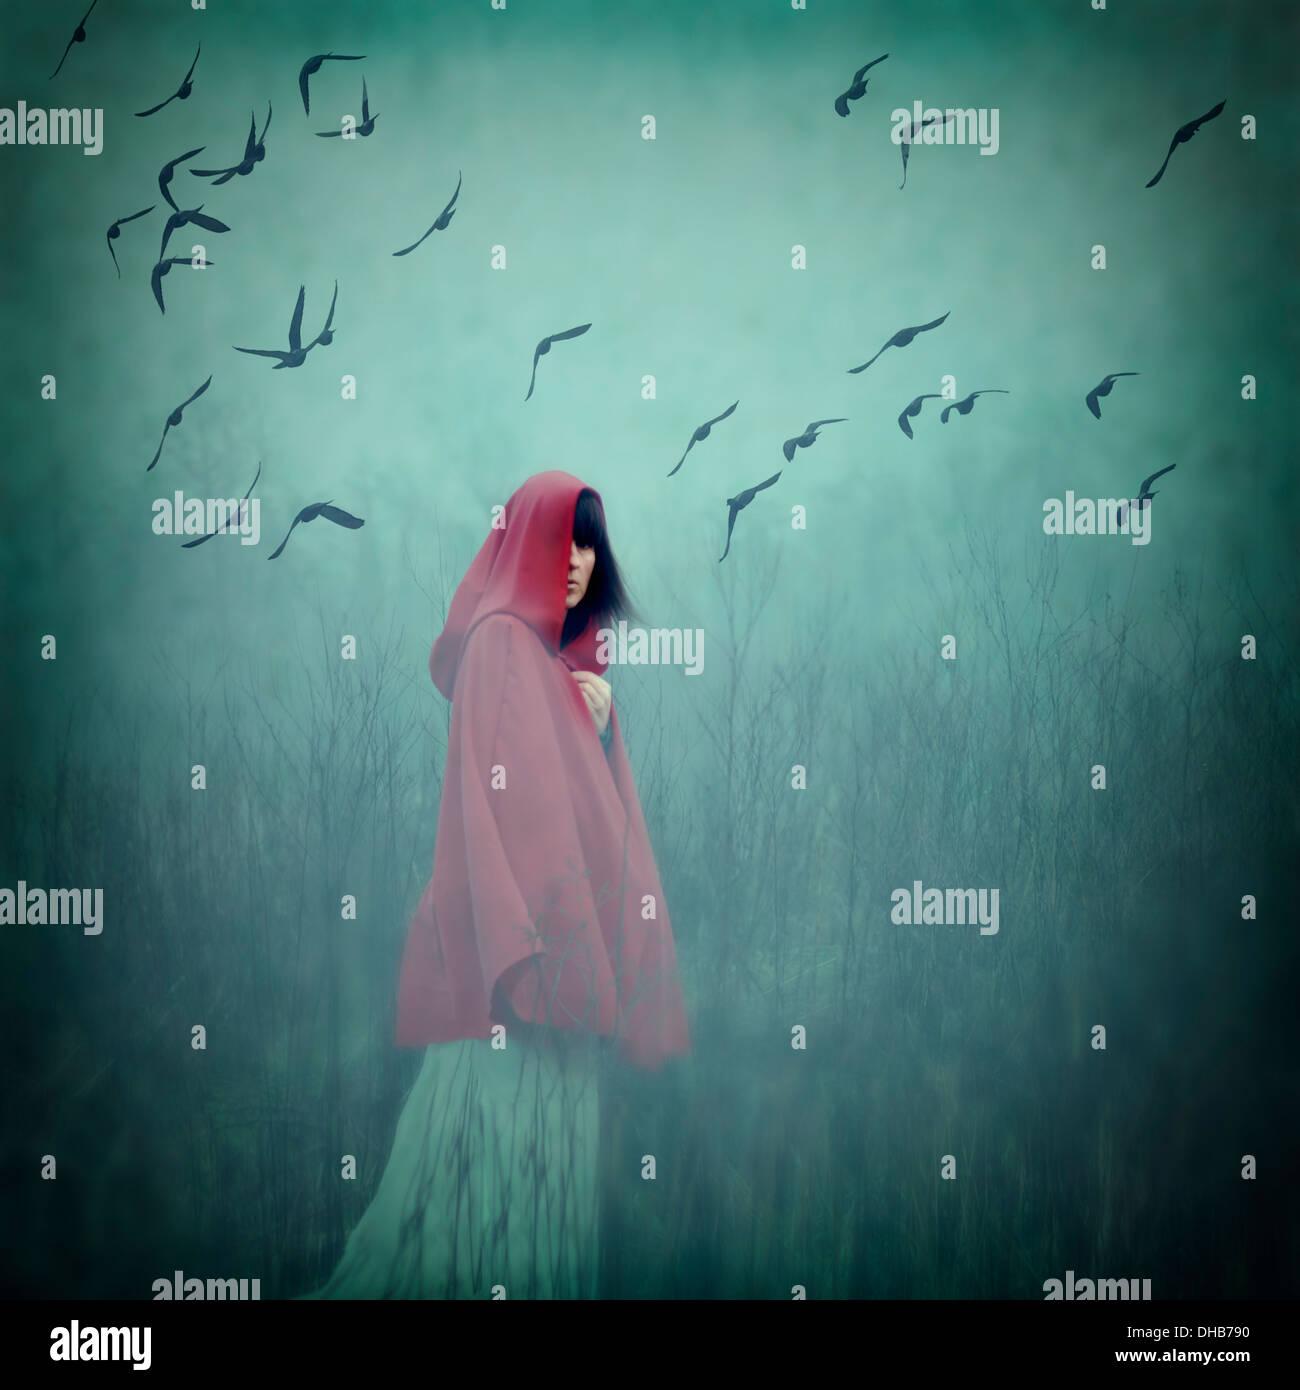 Frau mit roten Umhang walking im freien Stockbild